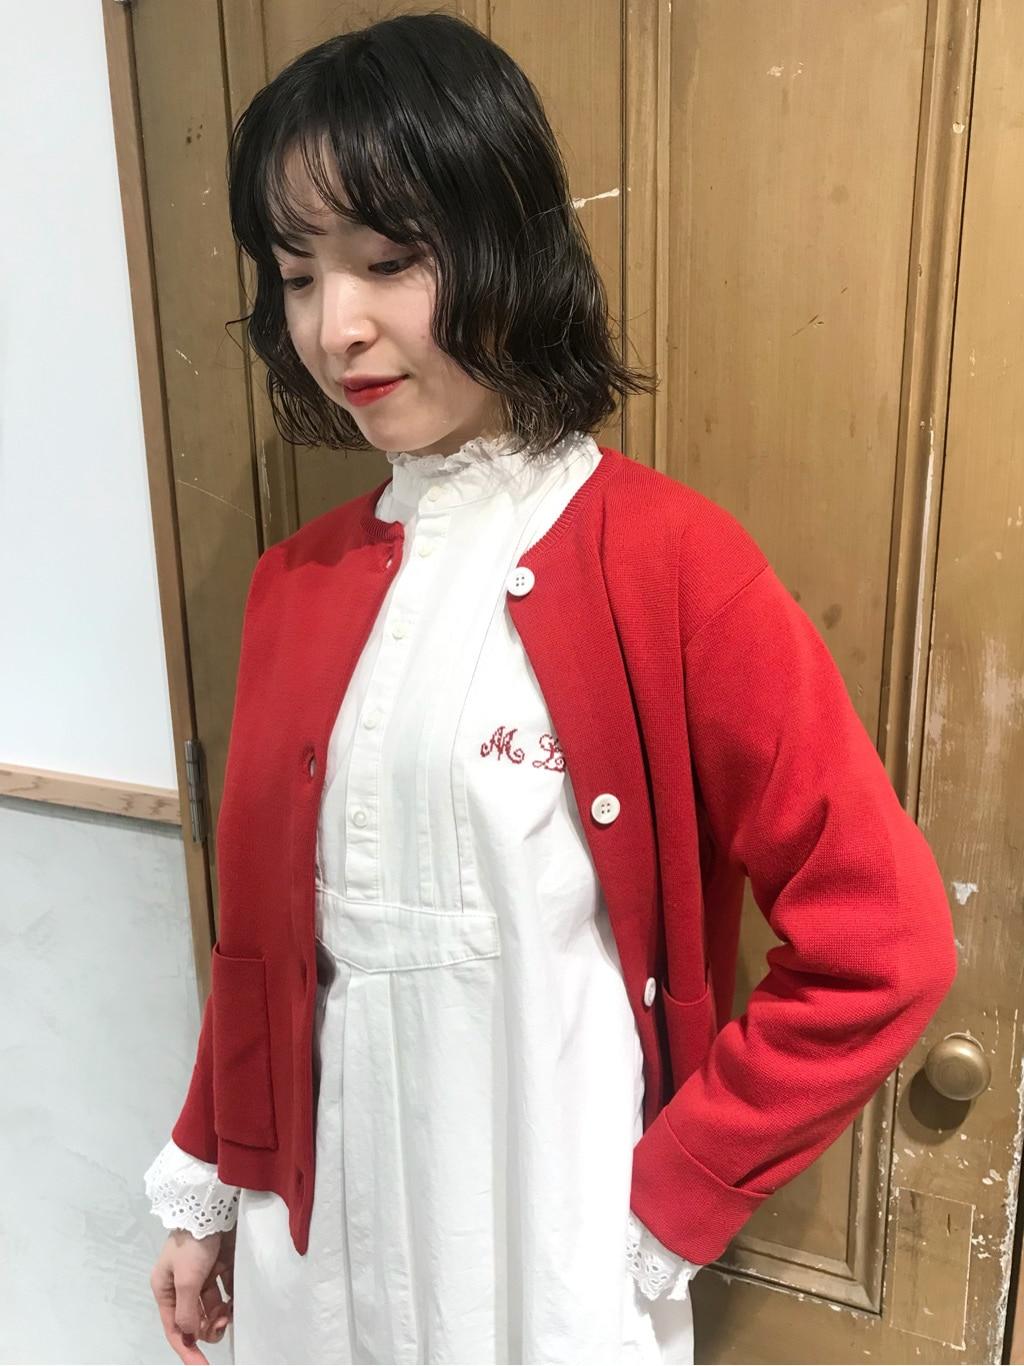 Malle chambre de charme ルミネ新宿 身長:164cm 2021.01.21